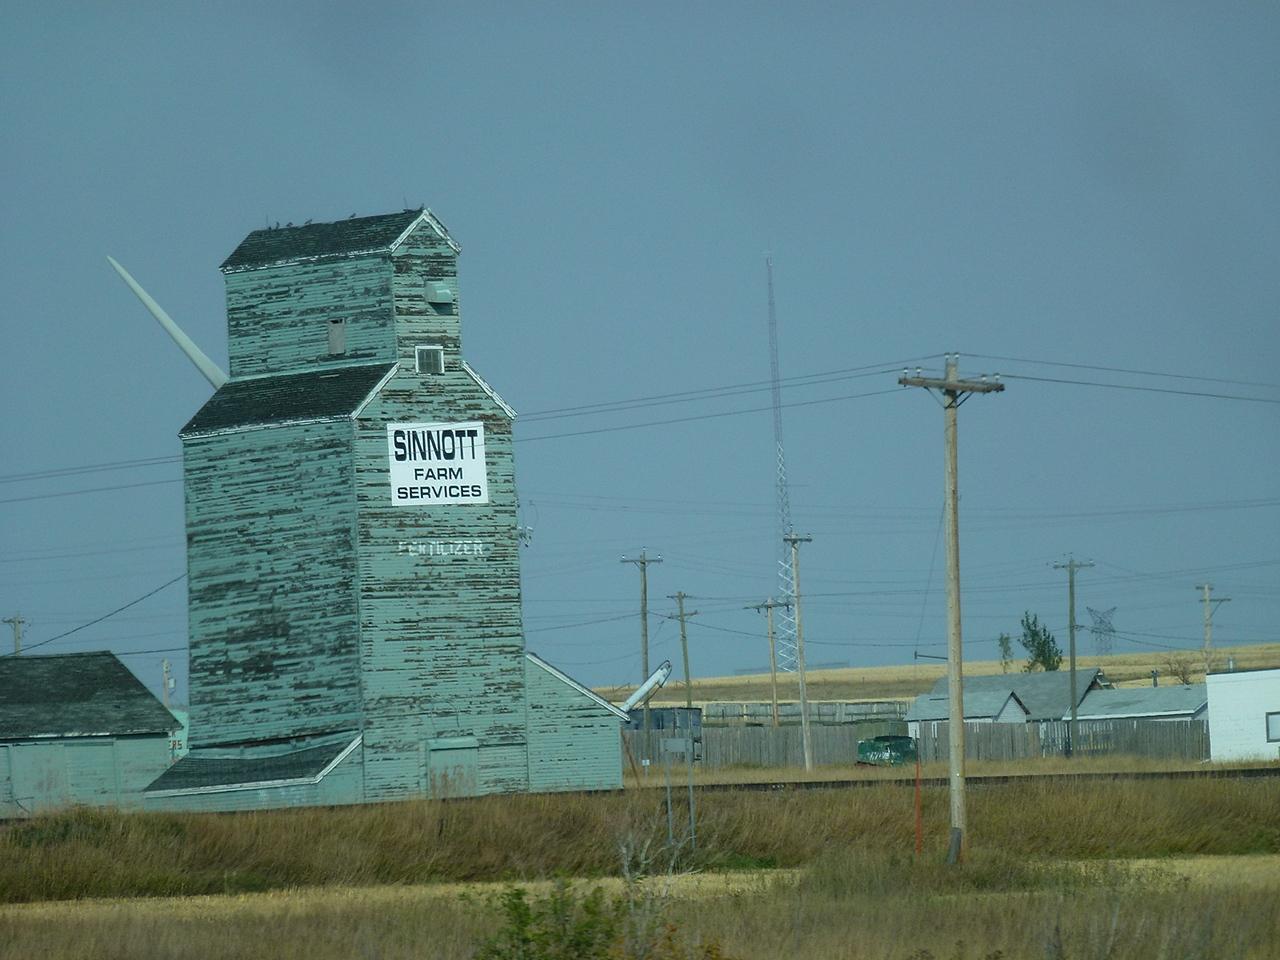 Old grain elevator in Alberta on way to Fort Macleod